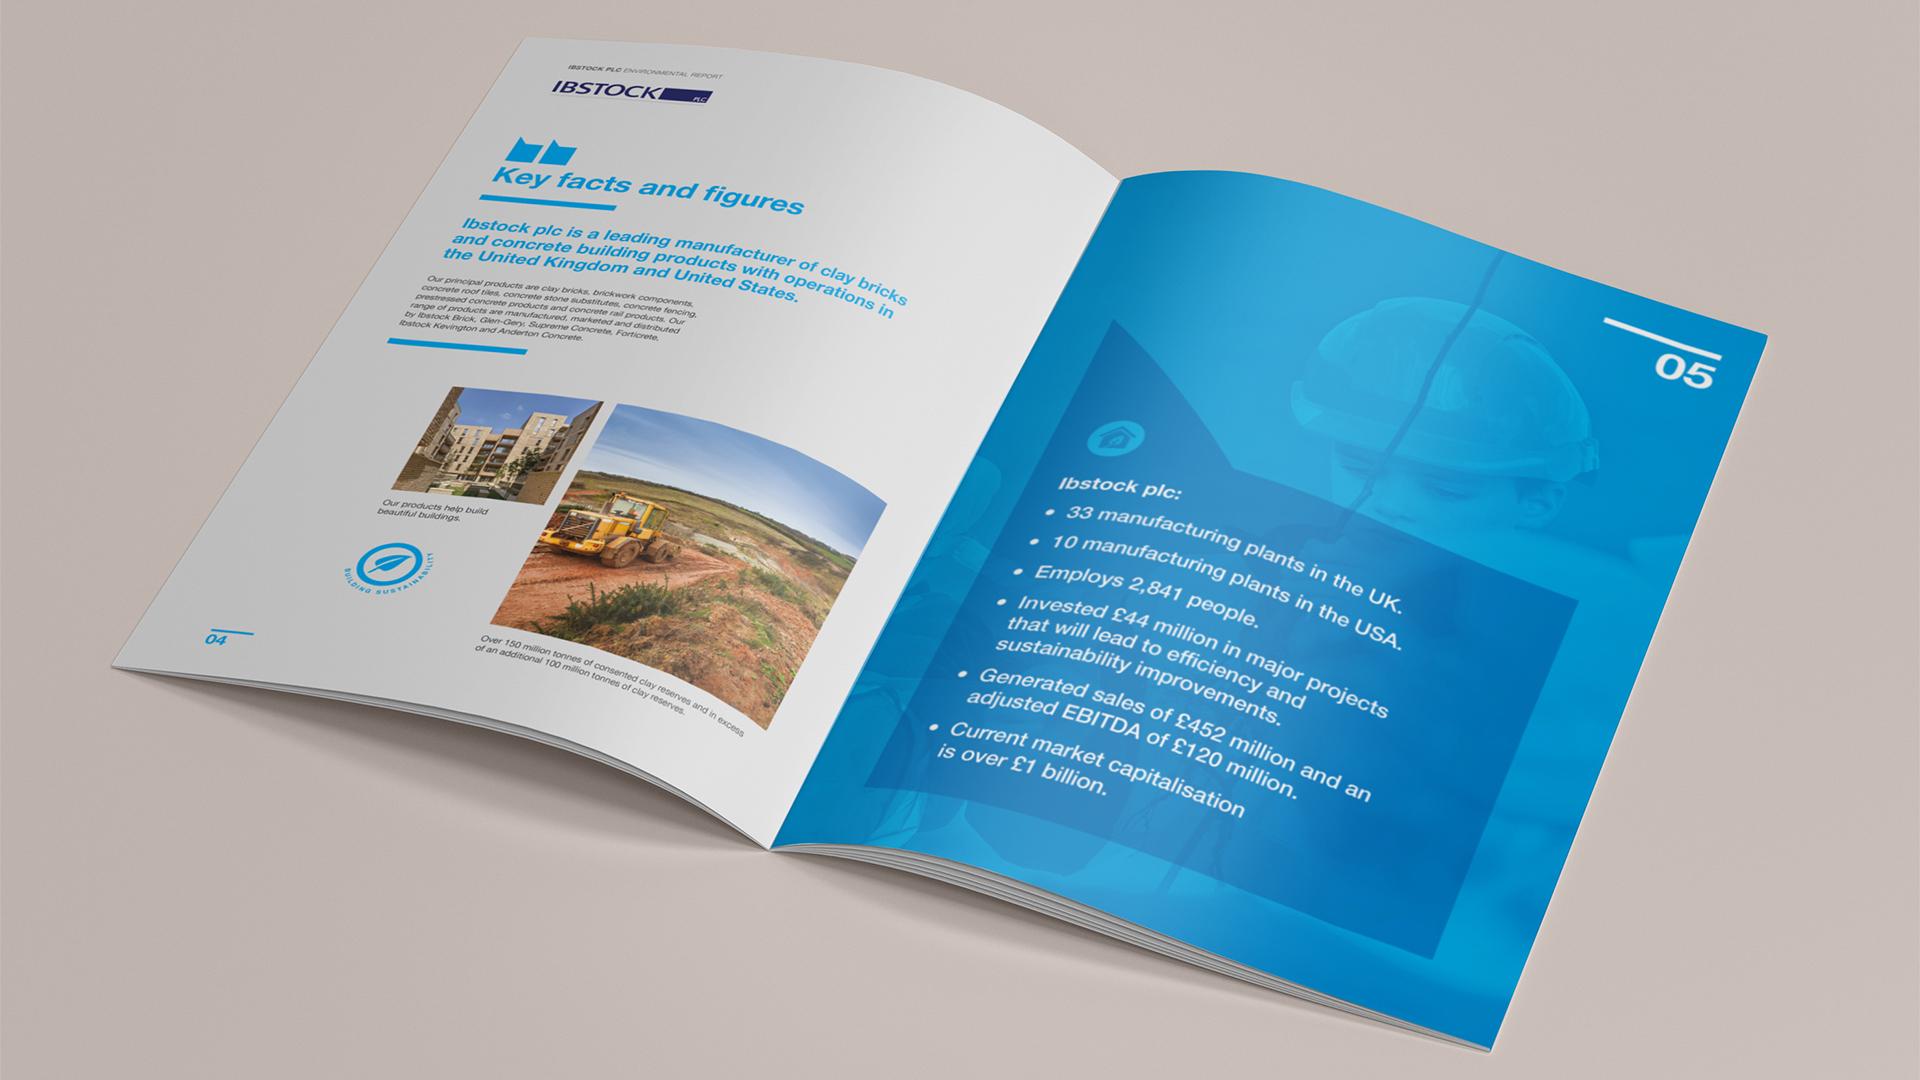 Mockup_A4_Brochure_3.jpg